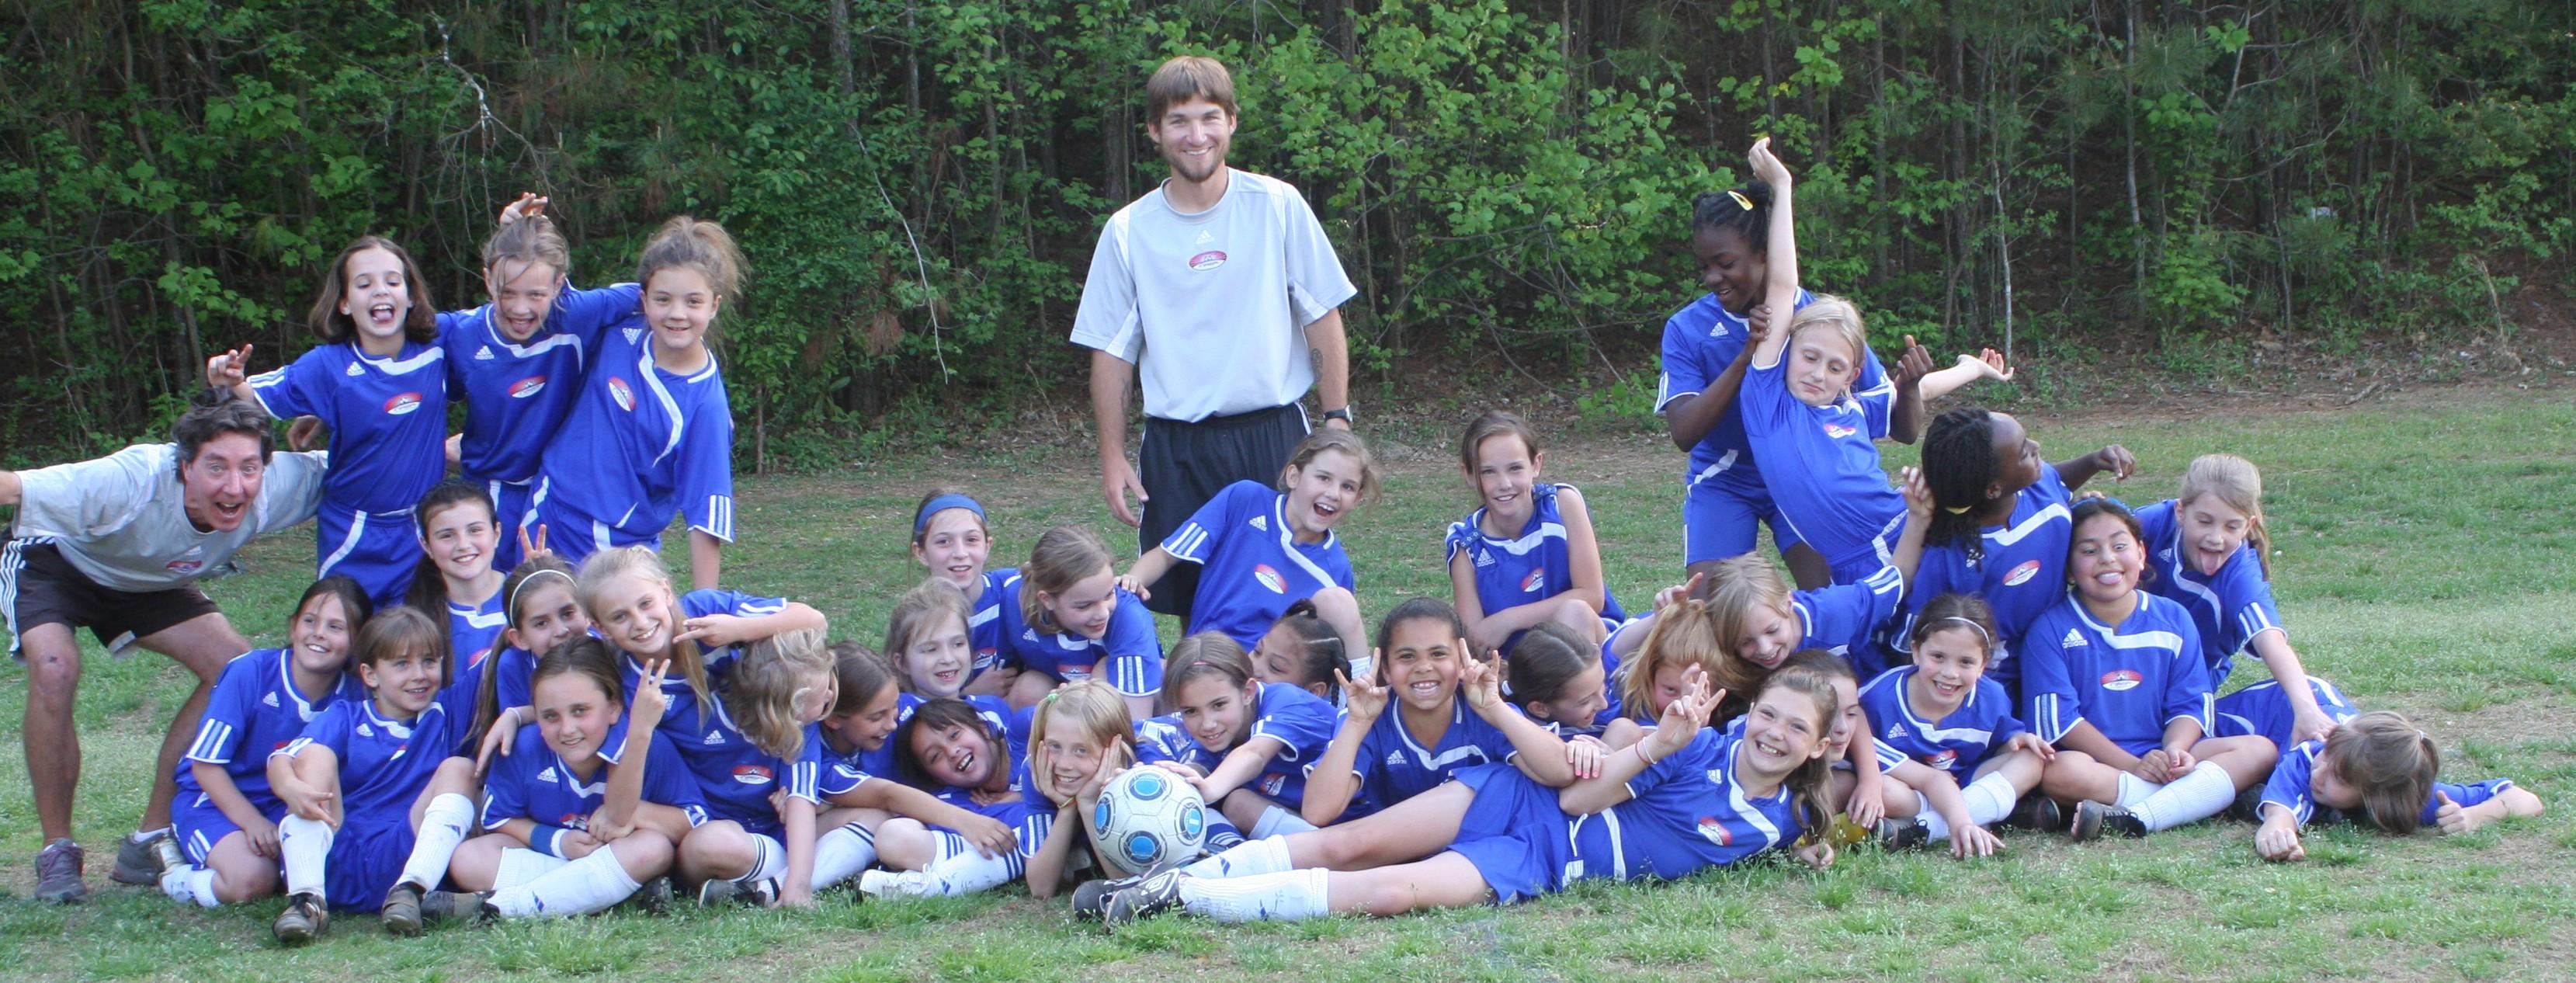 nasa soccer girls - photo #4